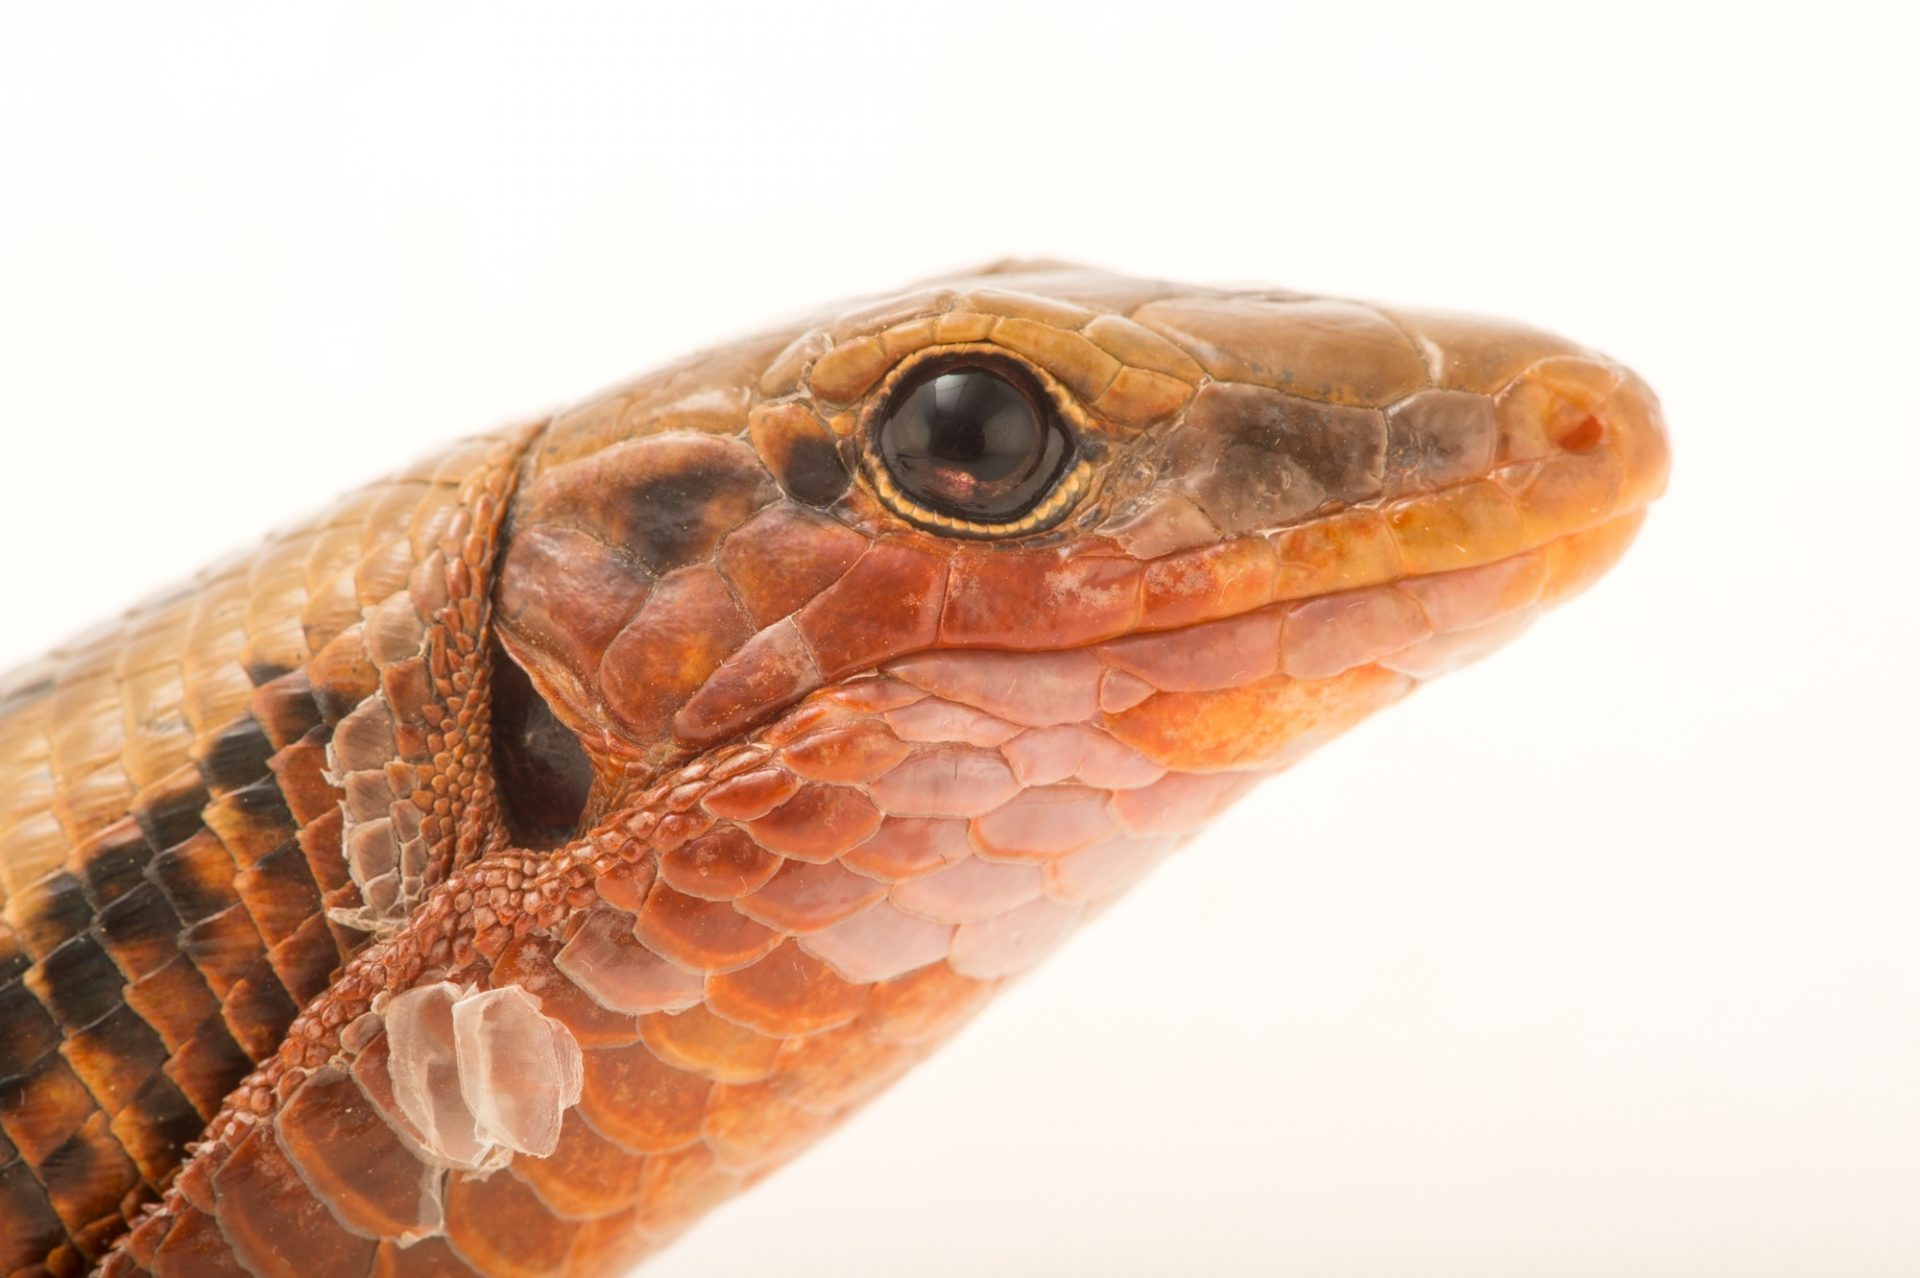 Photo: An Madagascar girdled lizard, Zonosaurus madagascariensis, at Tsimbazaza Zoo.